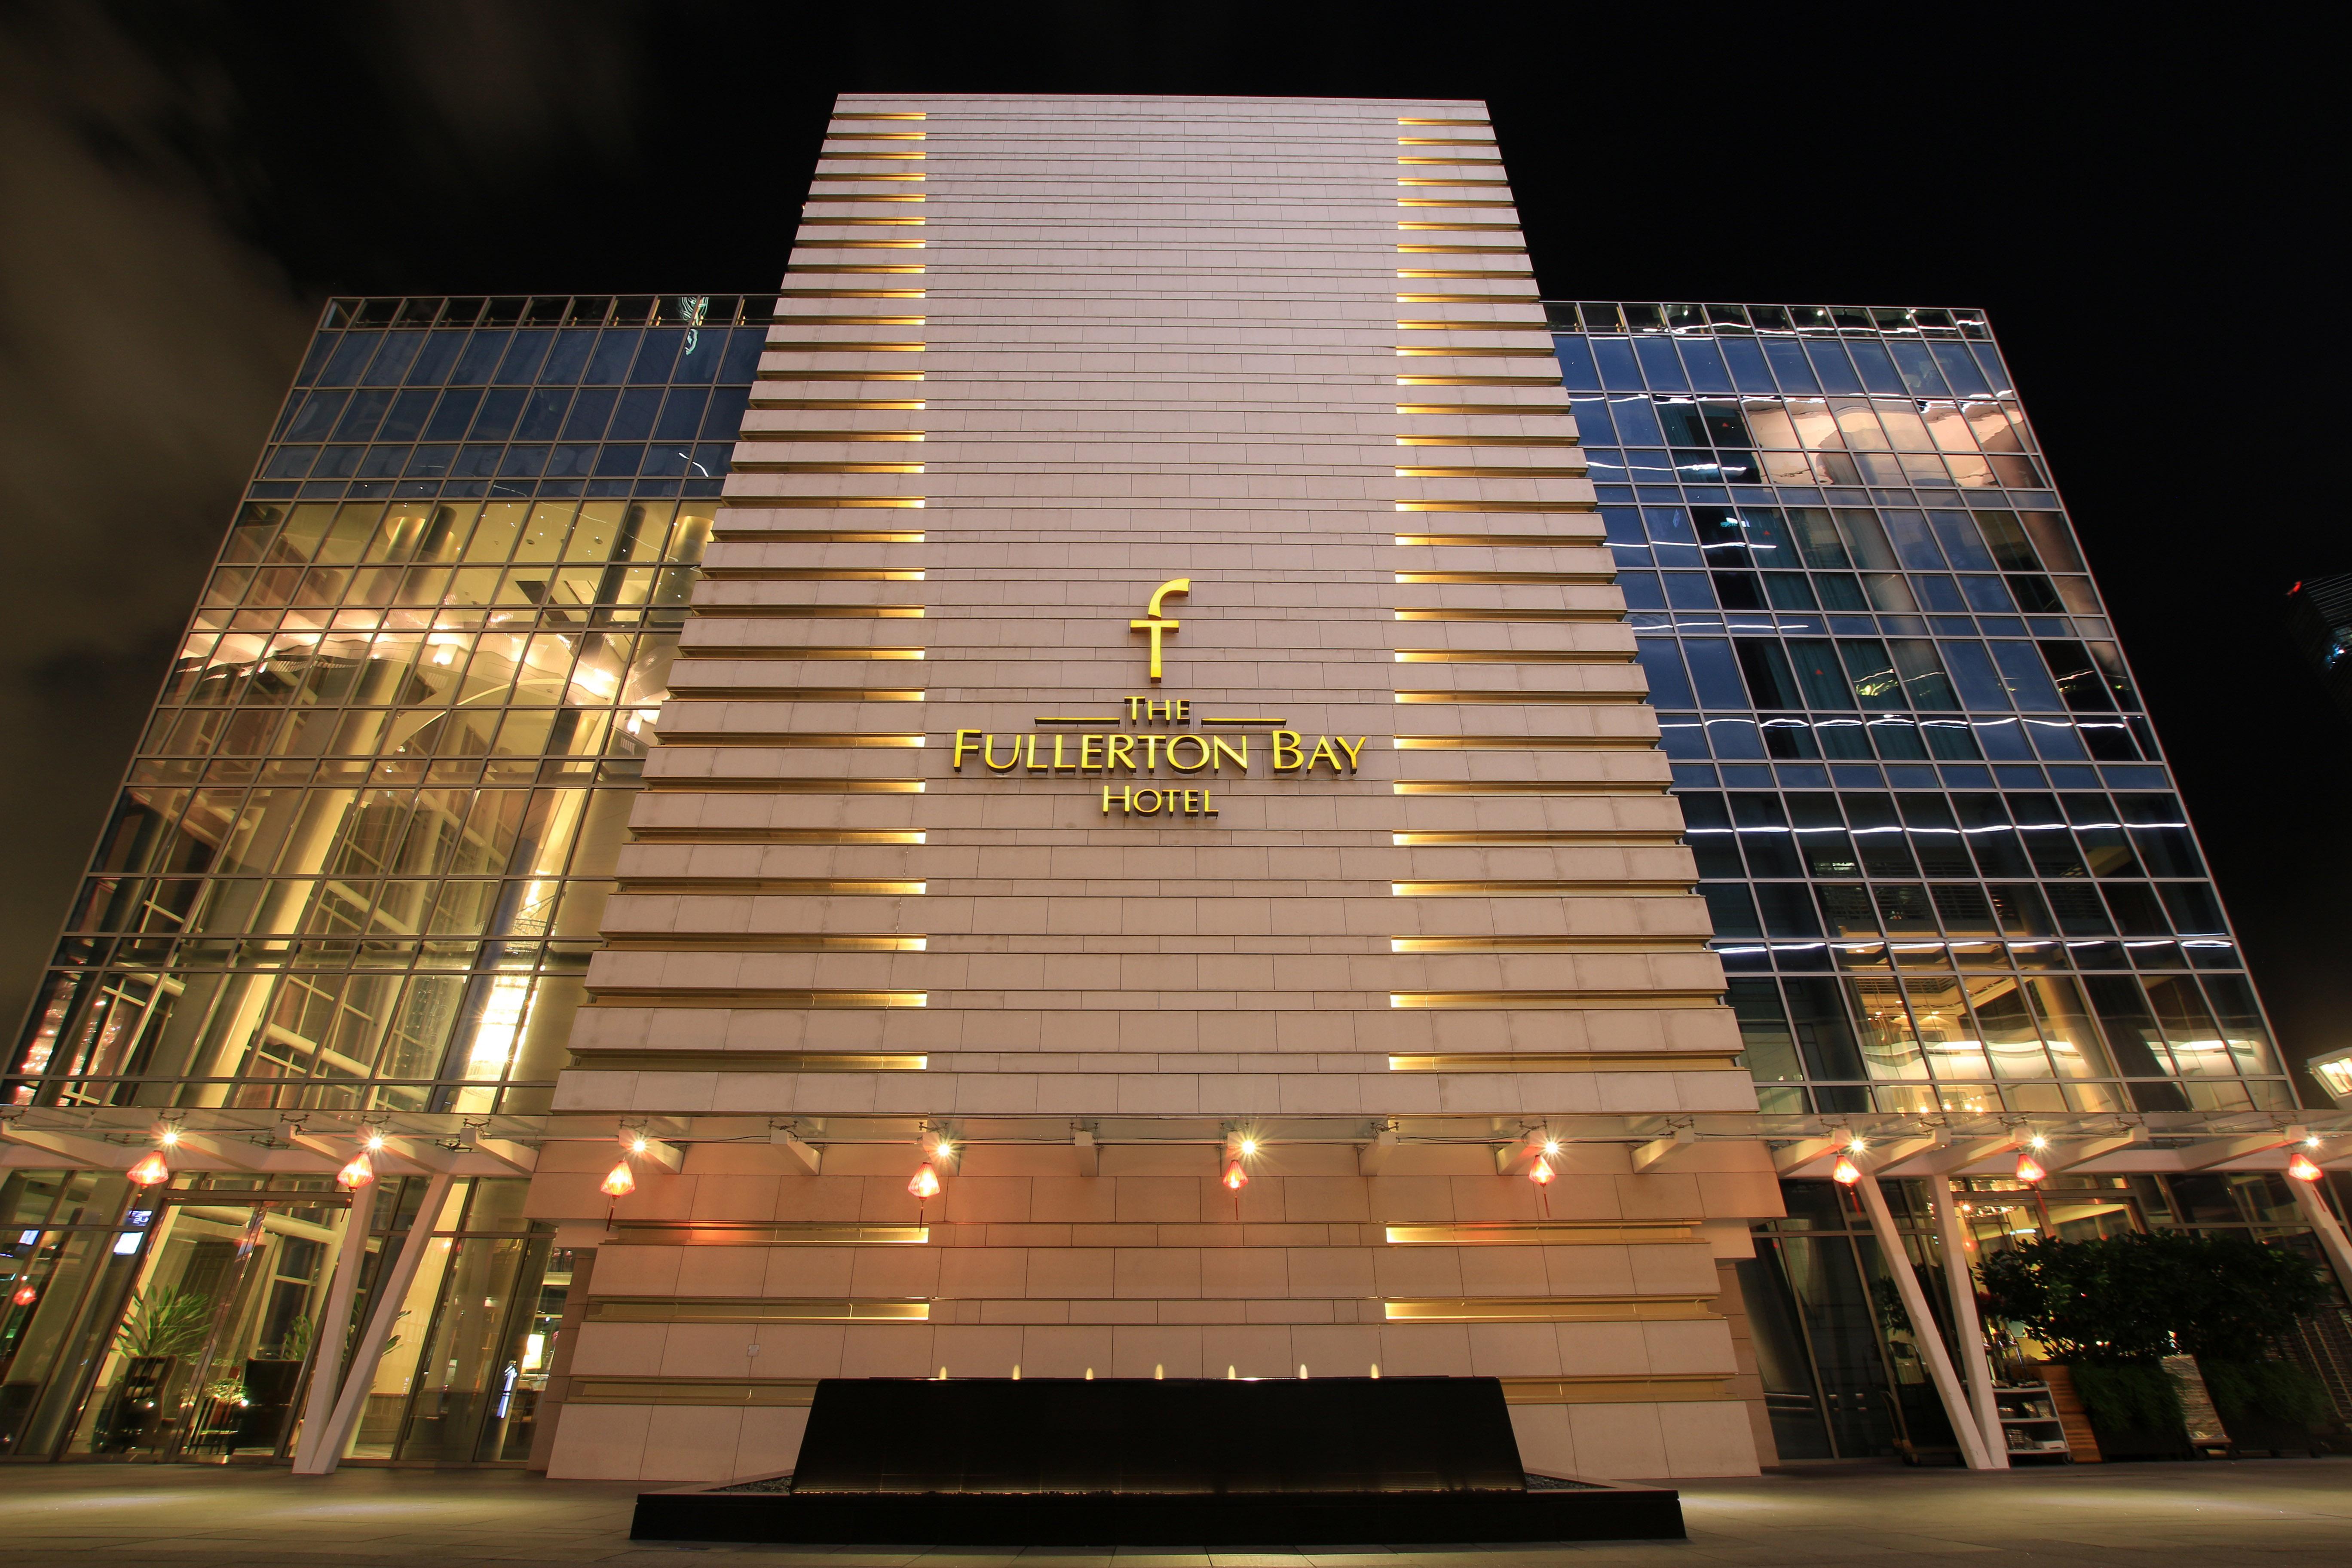 Fullerton Bay Hotel In Singapore Image Free Stock Photo